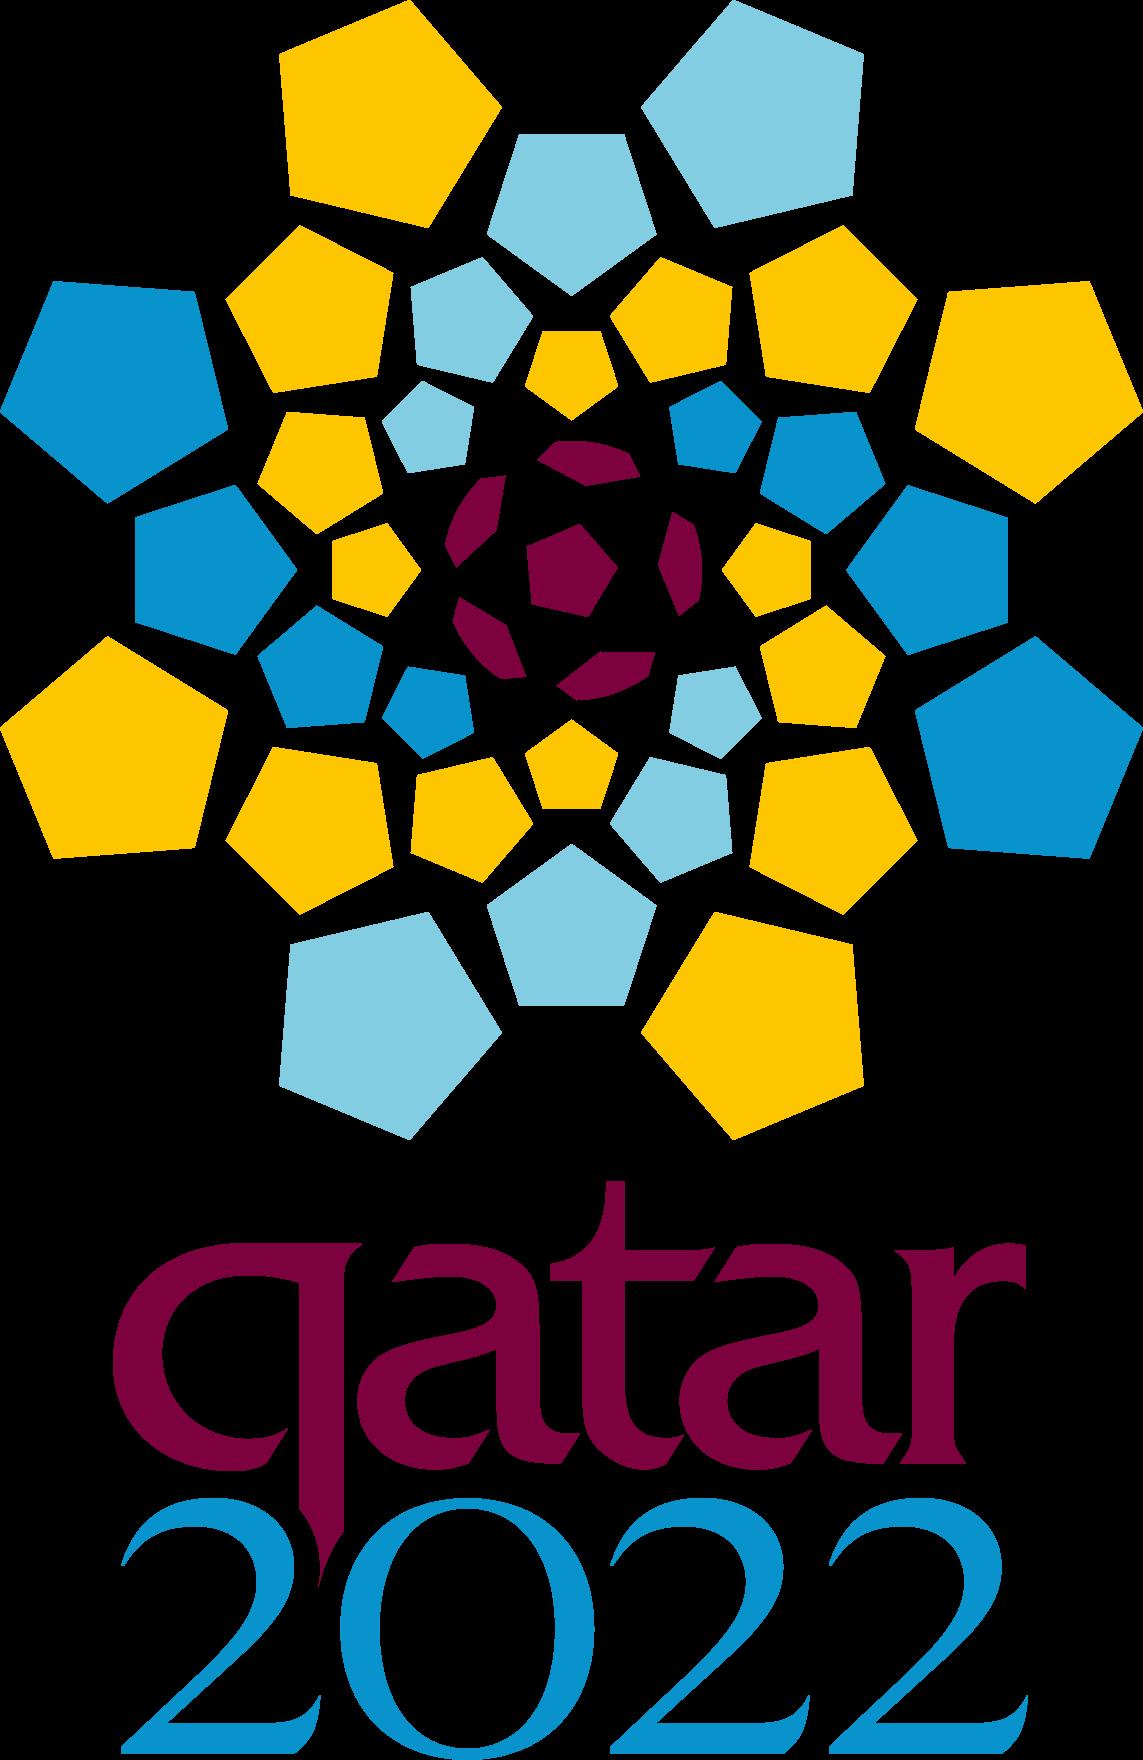 Qatar 2022 Logo (FIFA World Cup) png